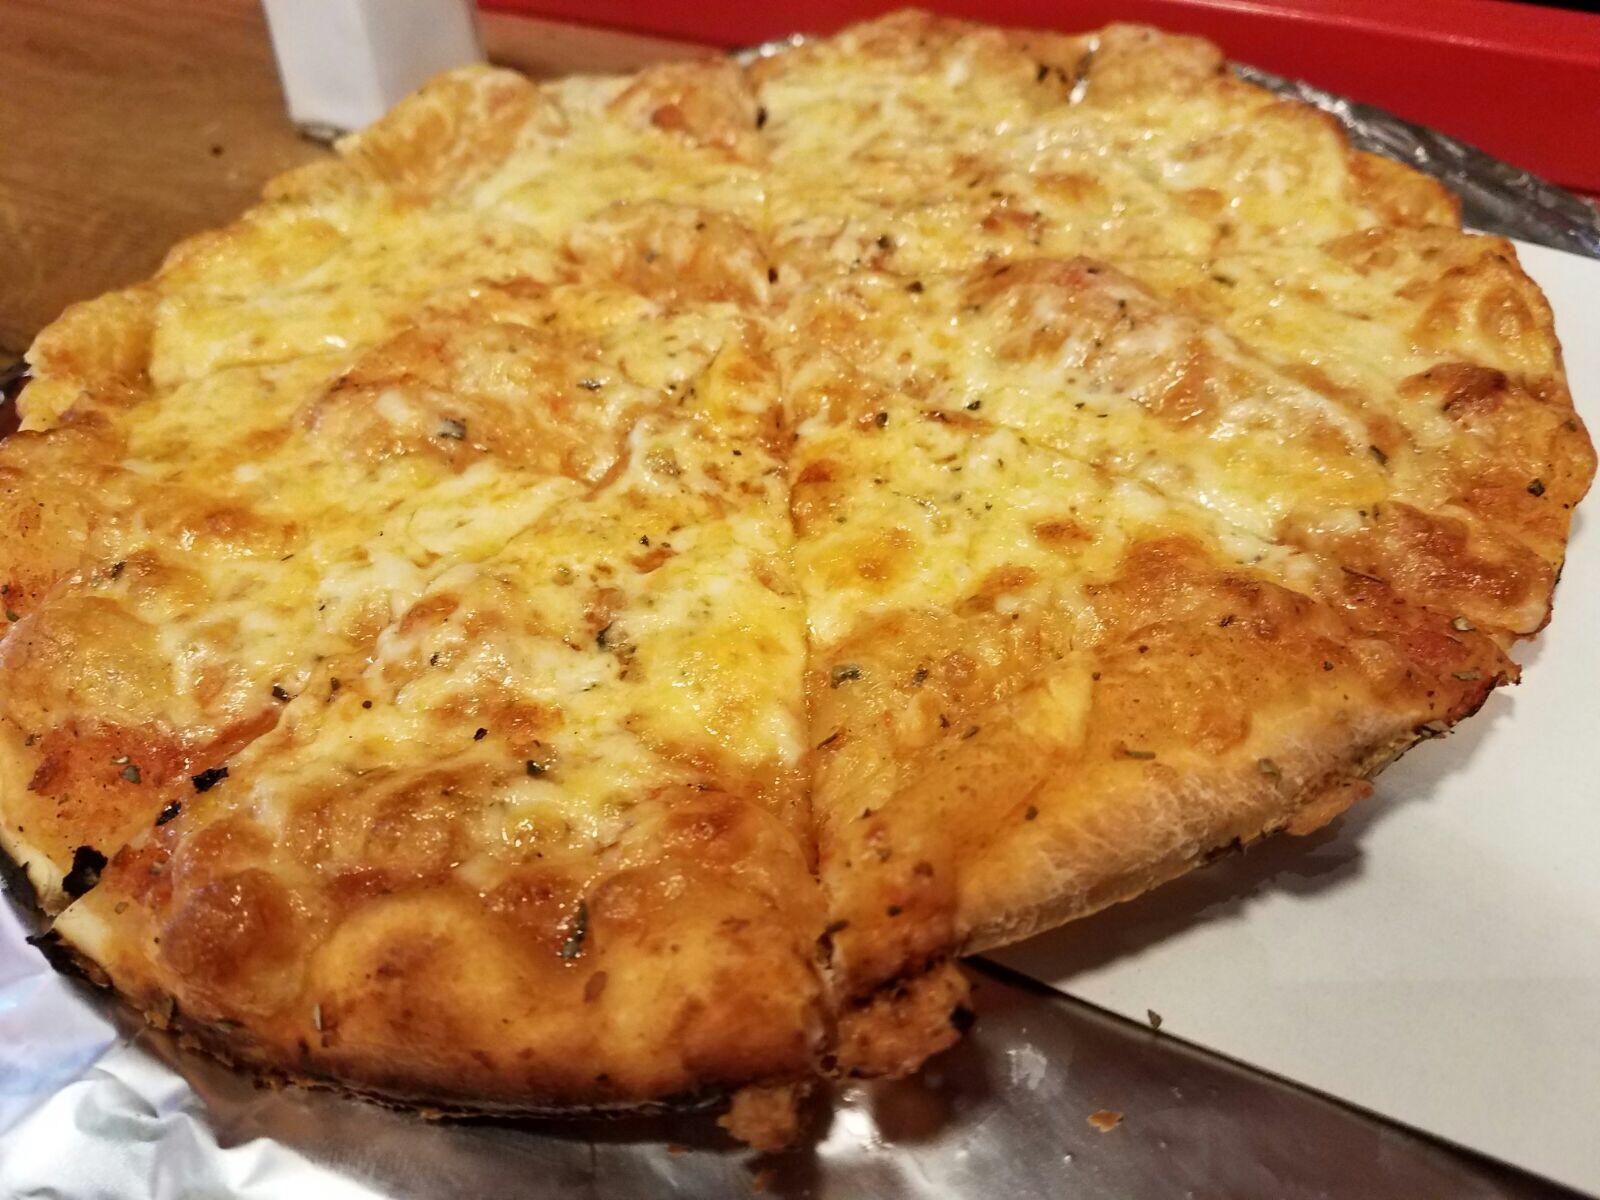 Gluten Free cheese pizza from Luigi's Pizza